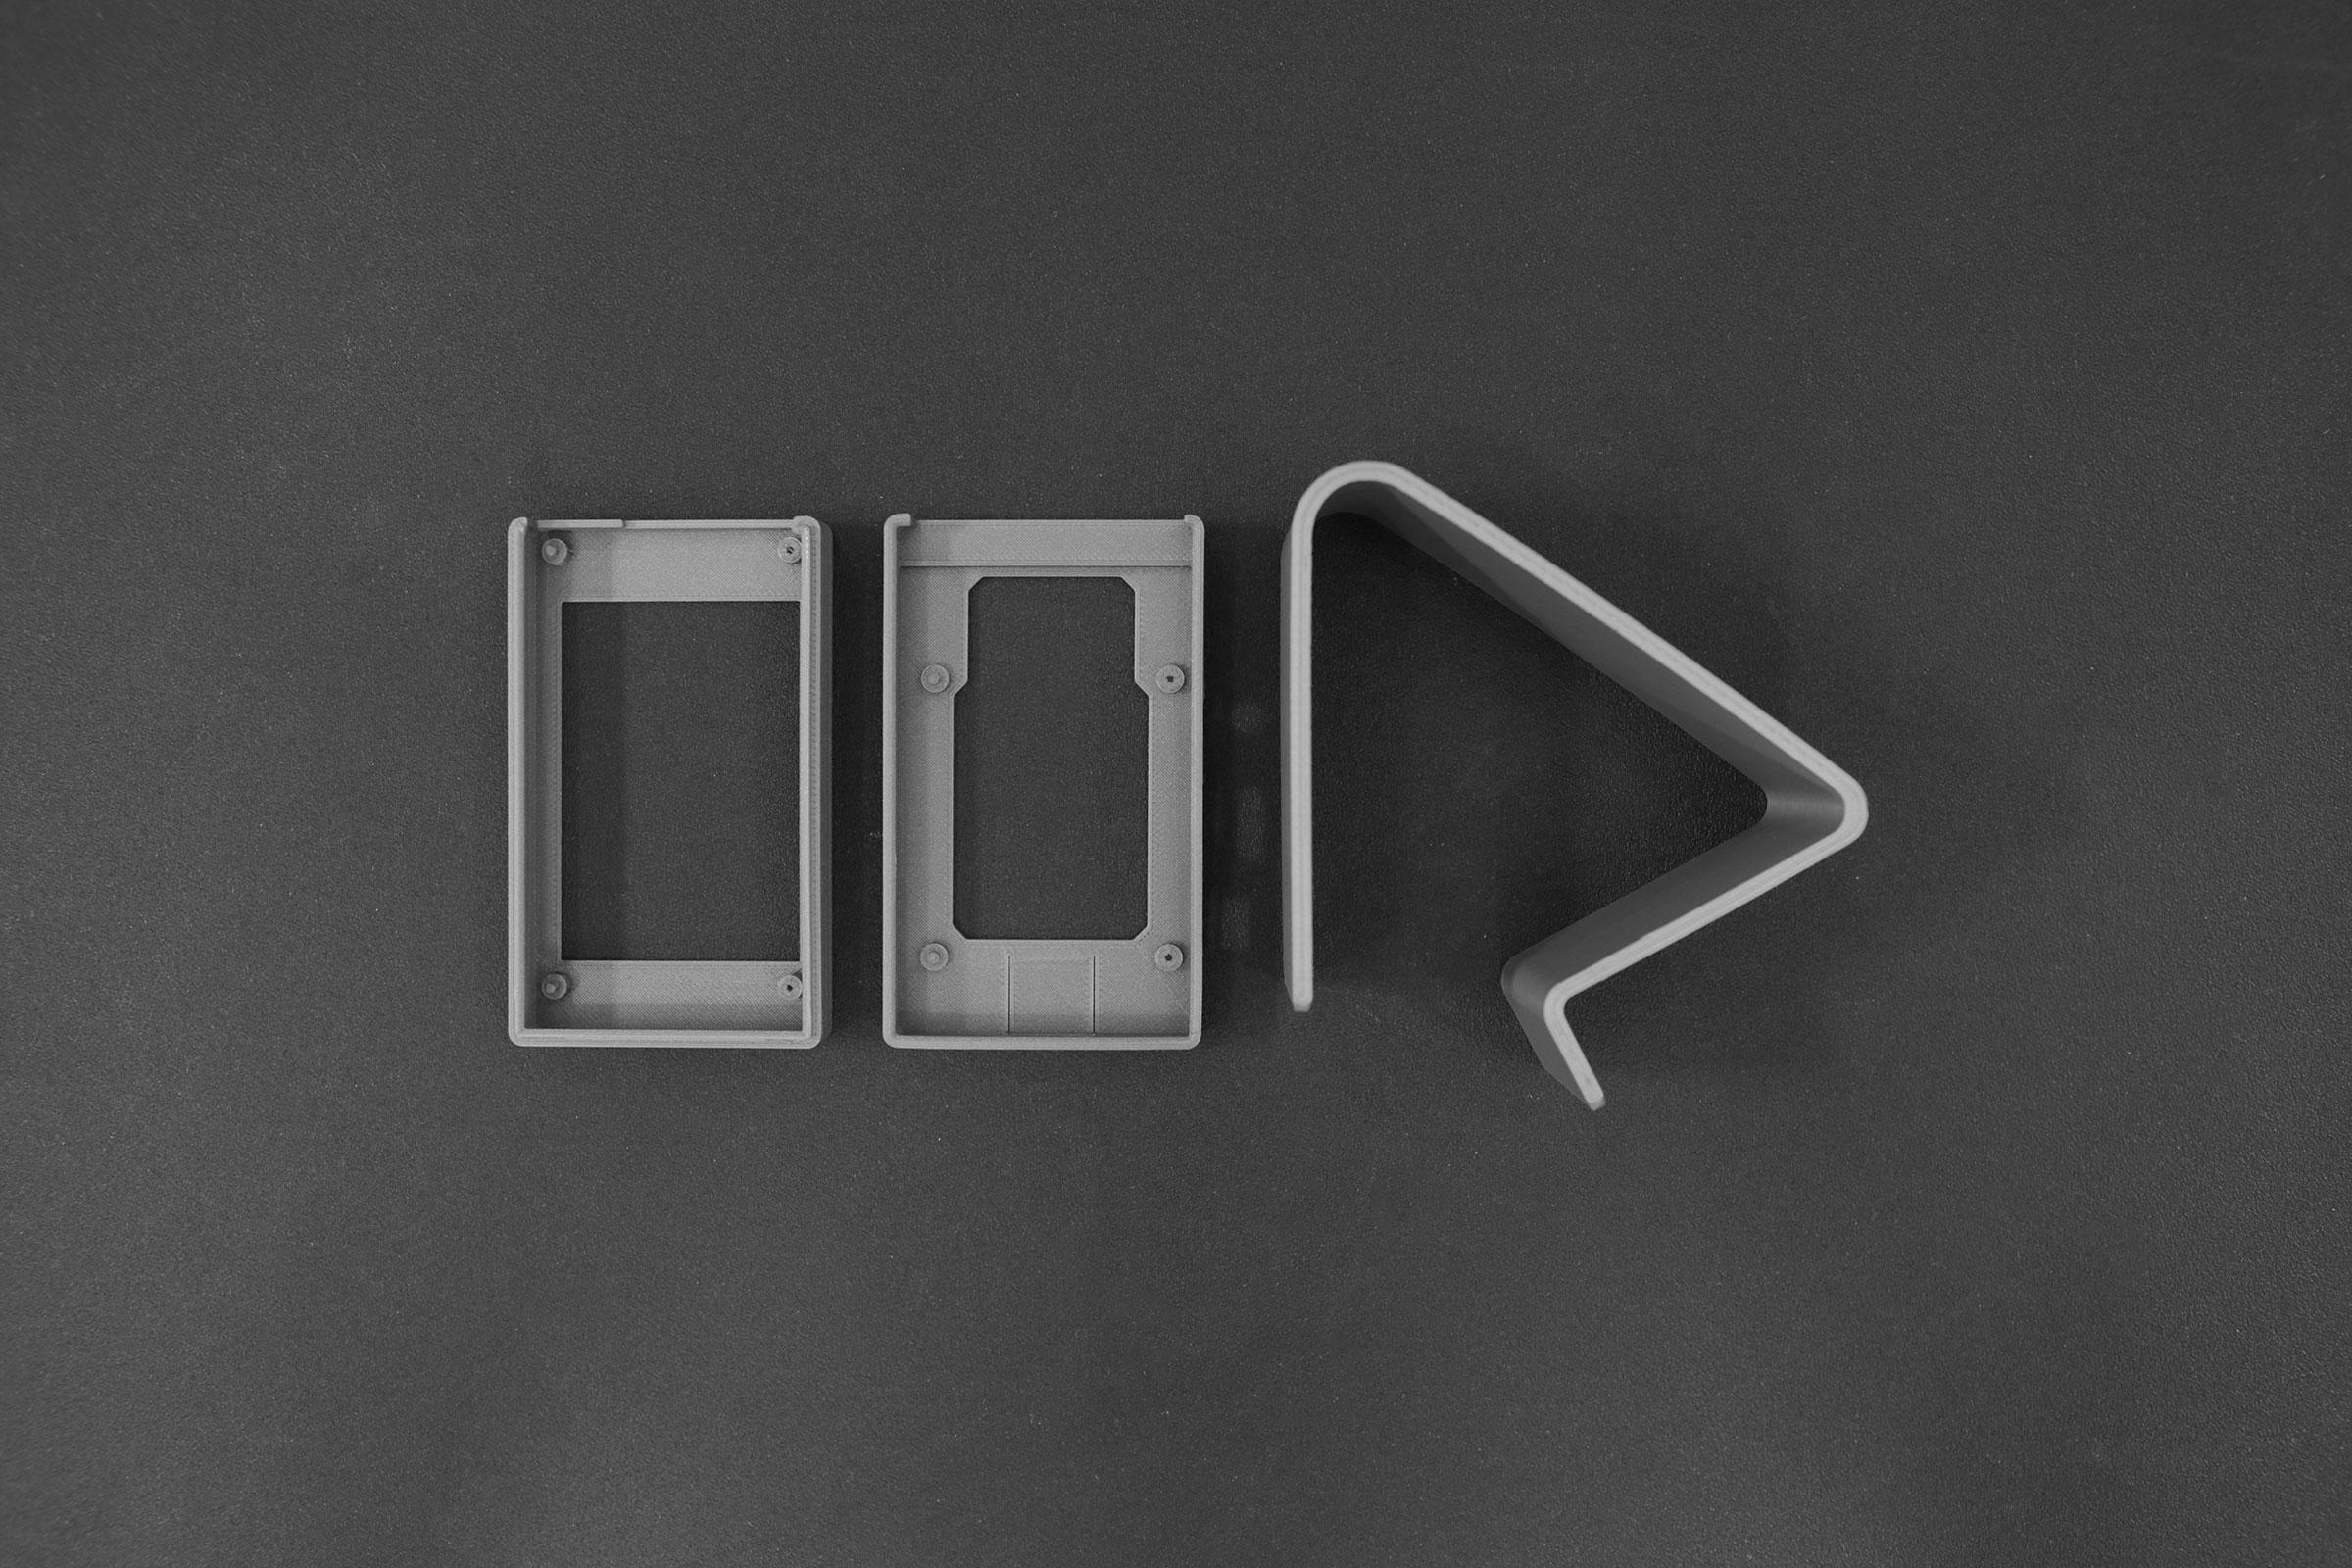 3d_printing_case-parts-2.jpg